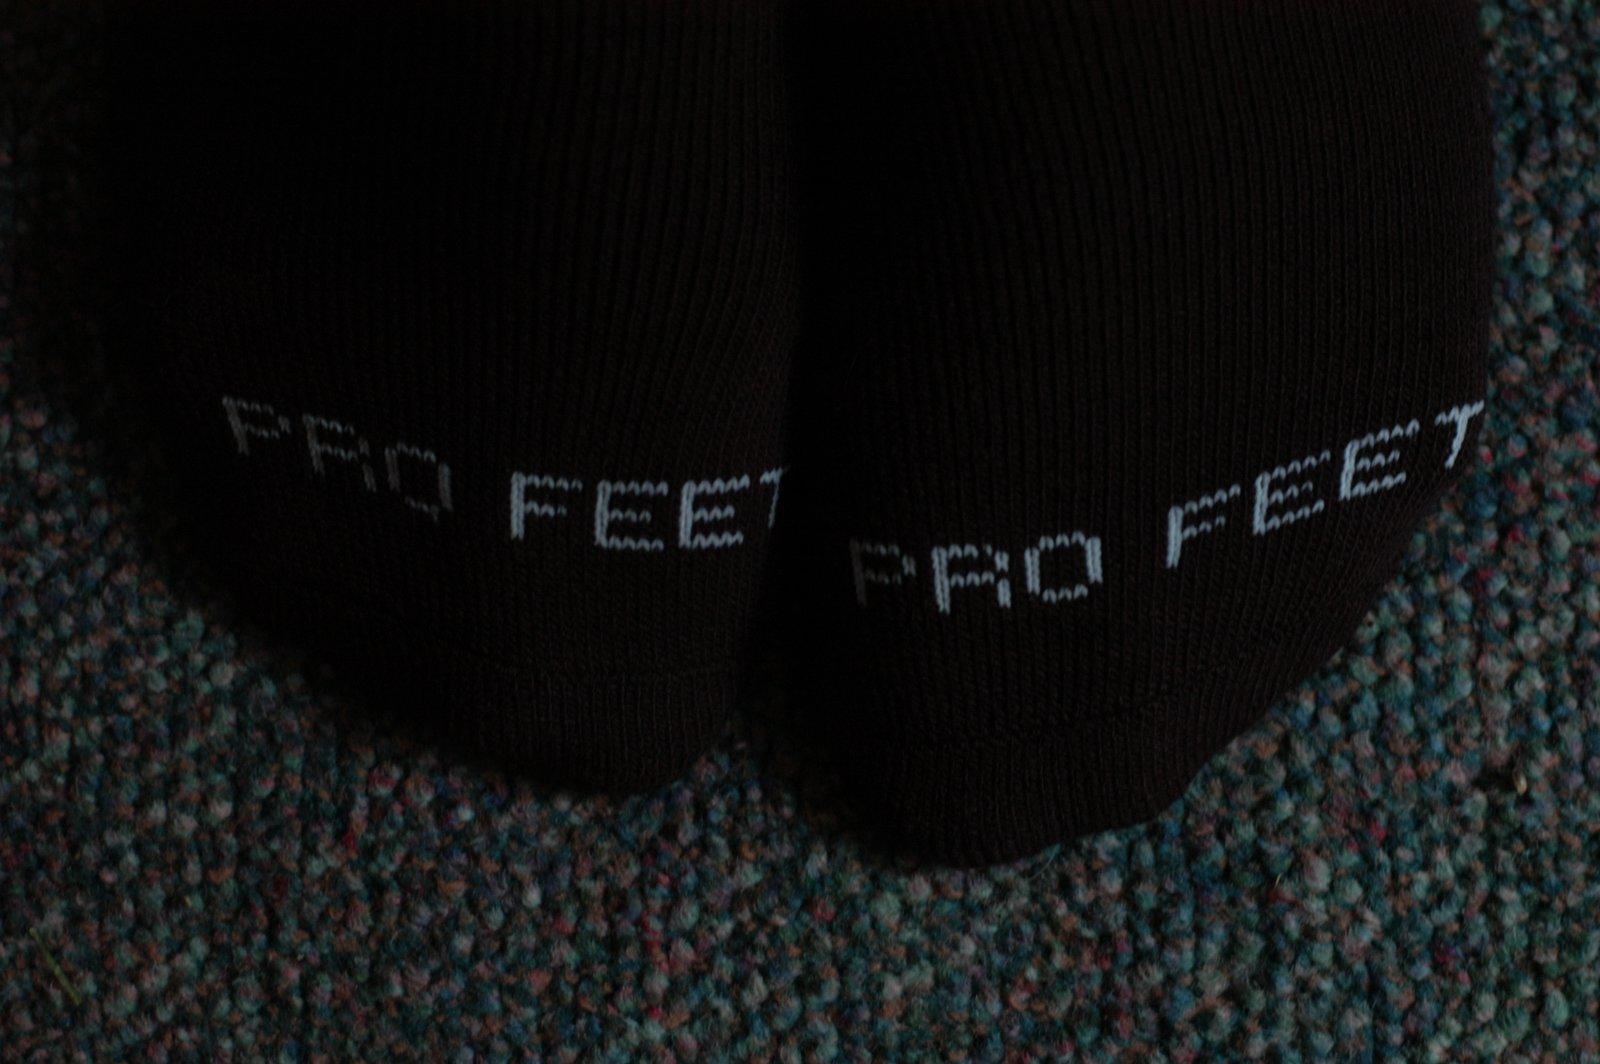 My foot is a PROOO